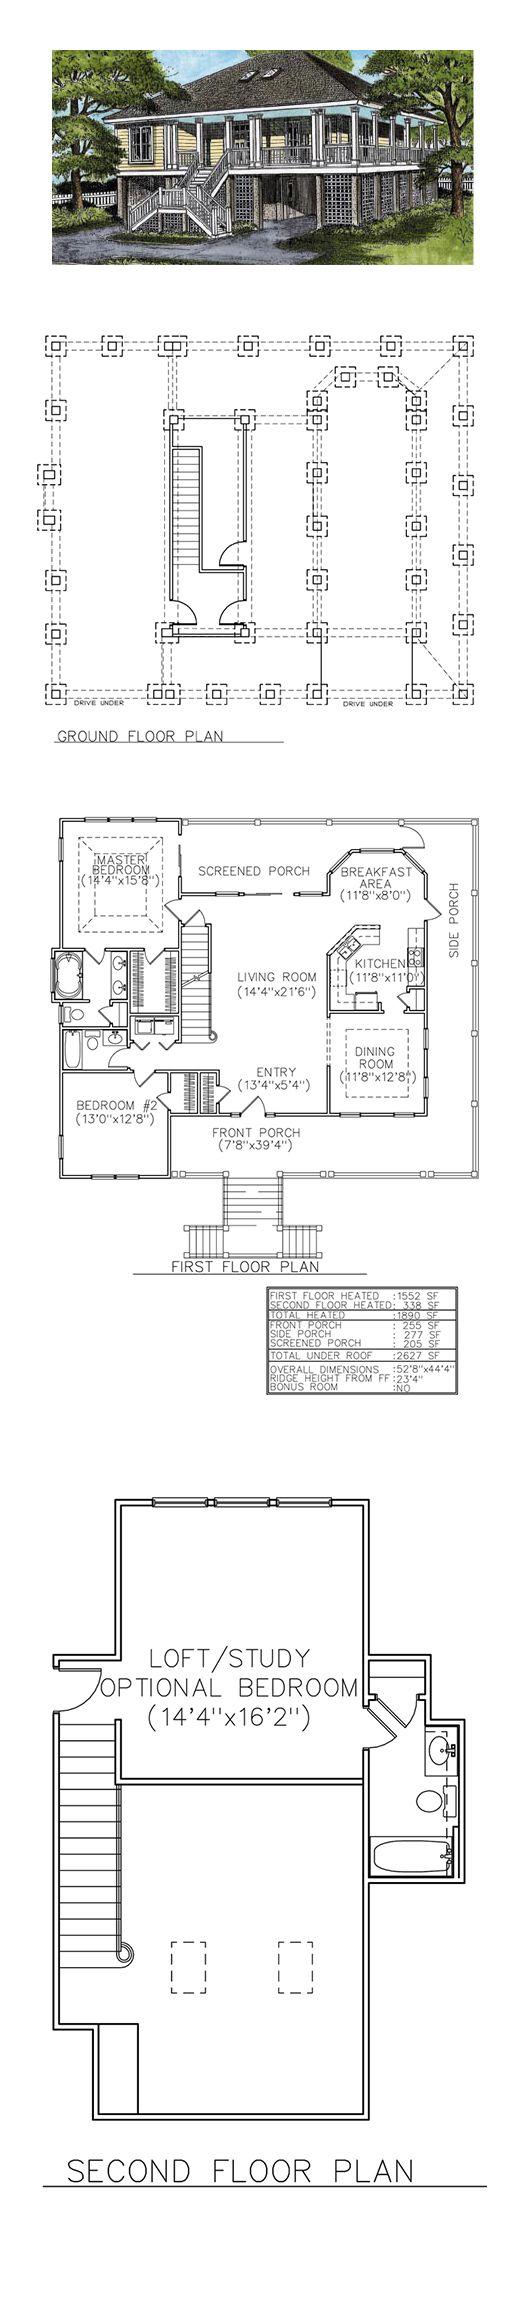 Coastal House Plan 45639   Coastal house plans, Bedrooms and House